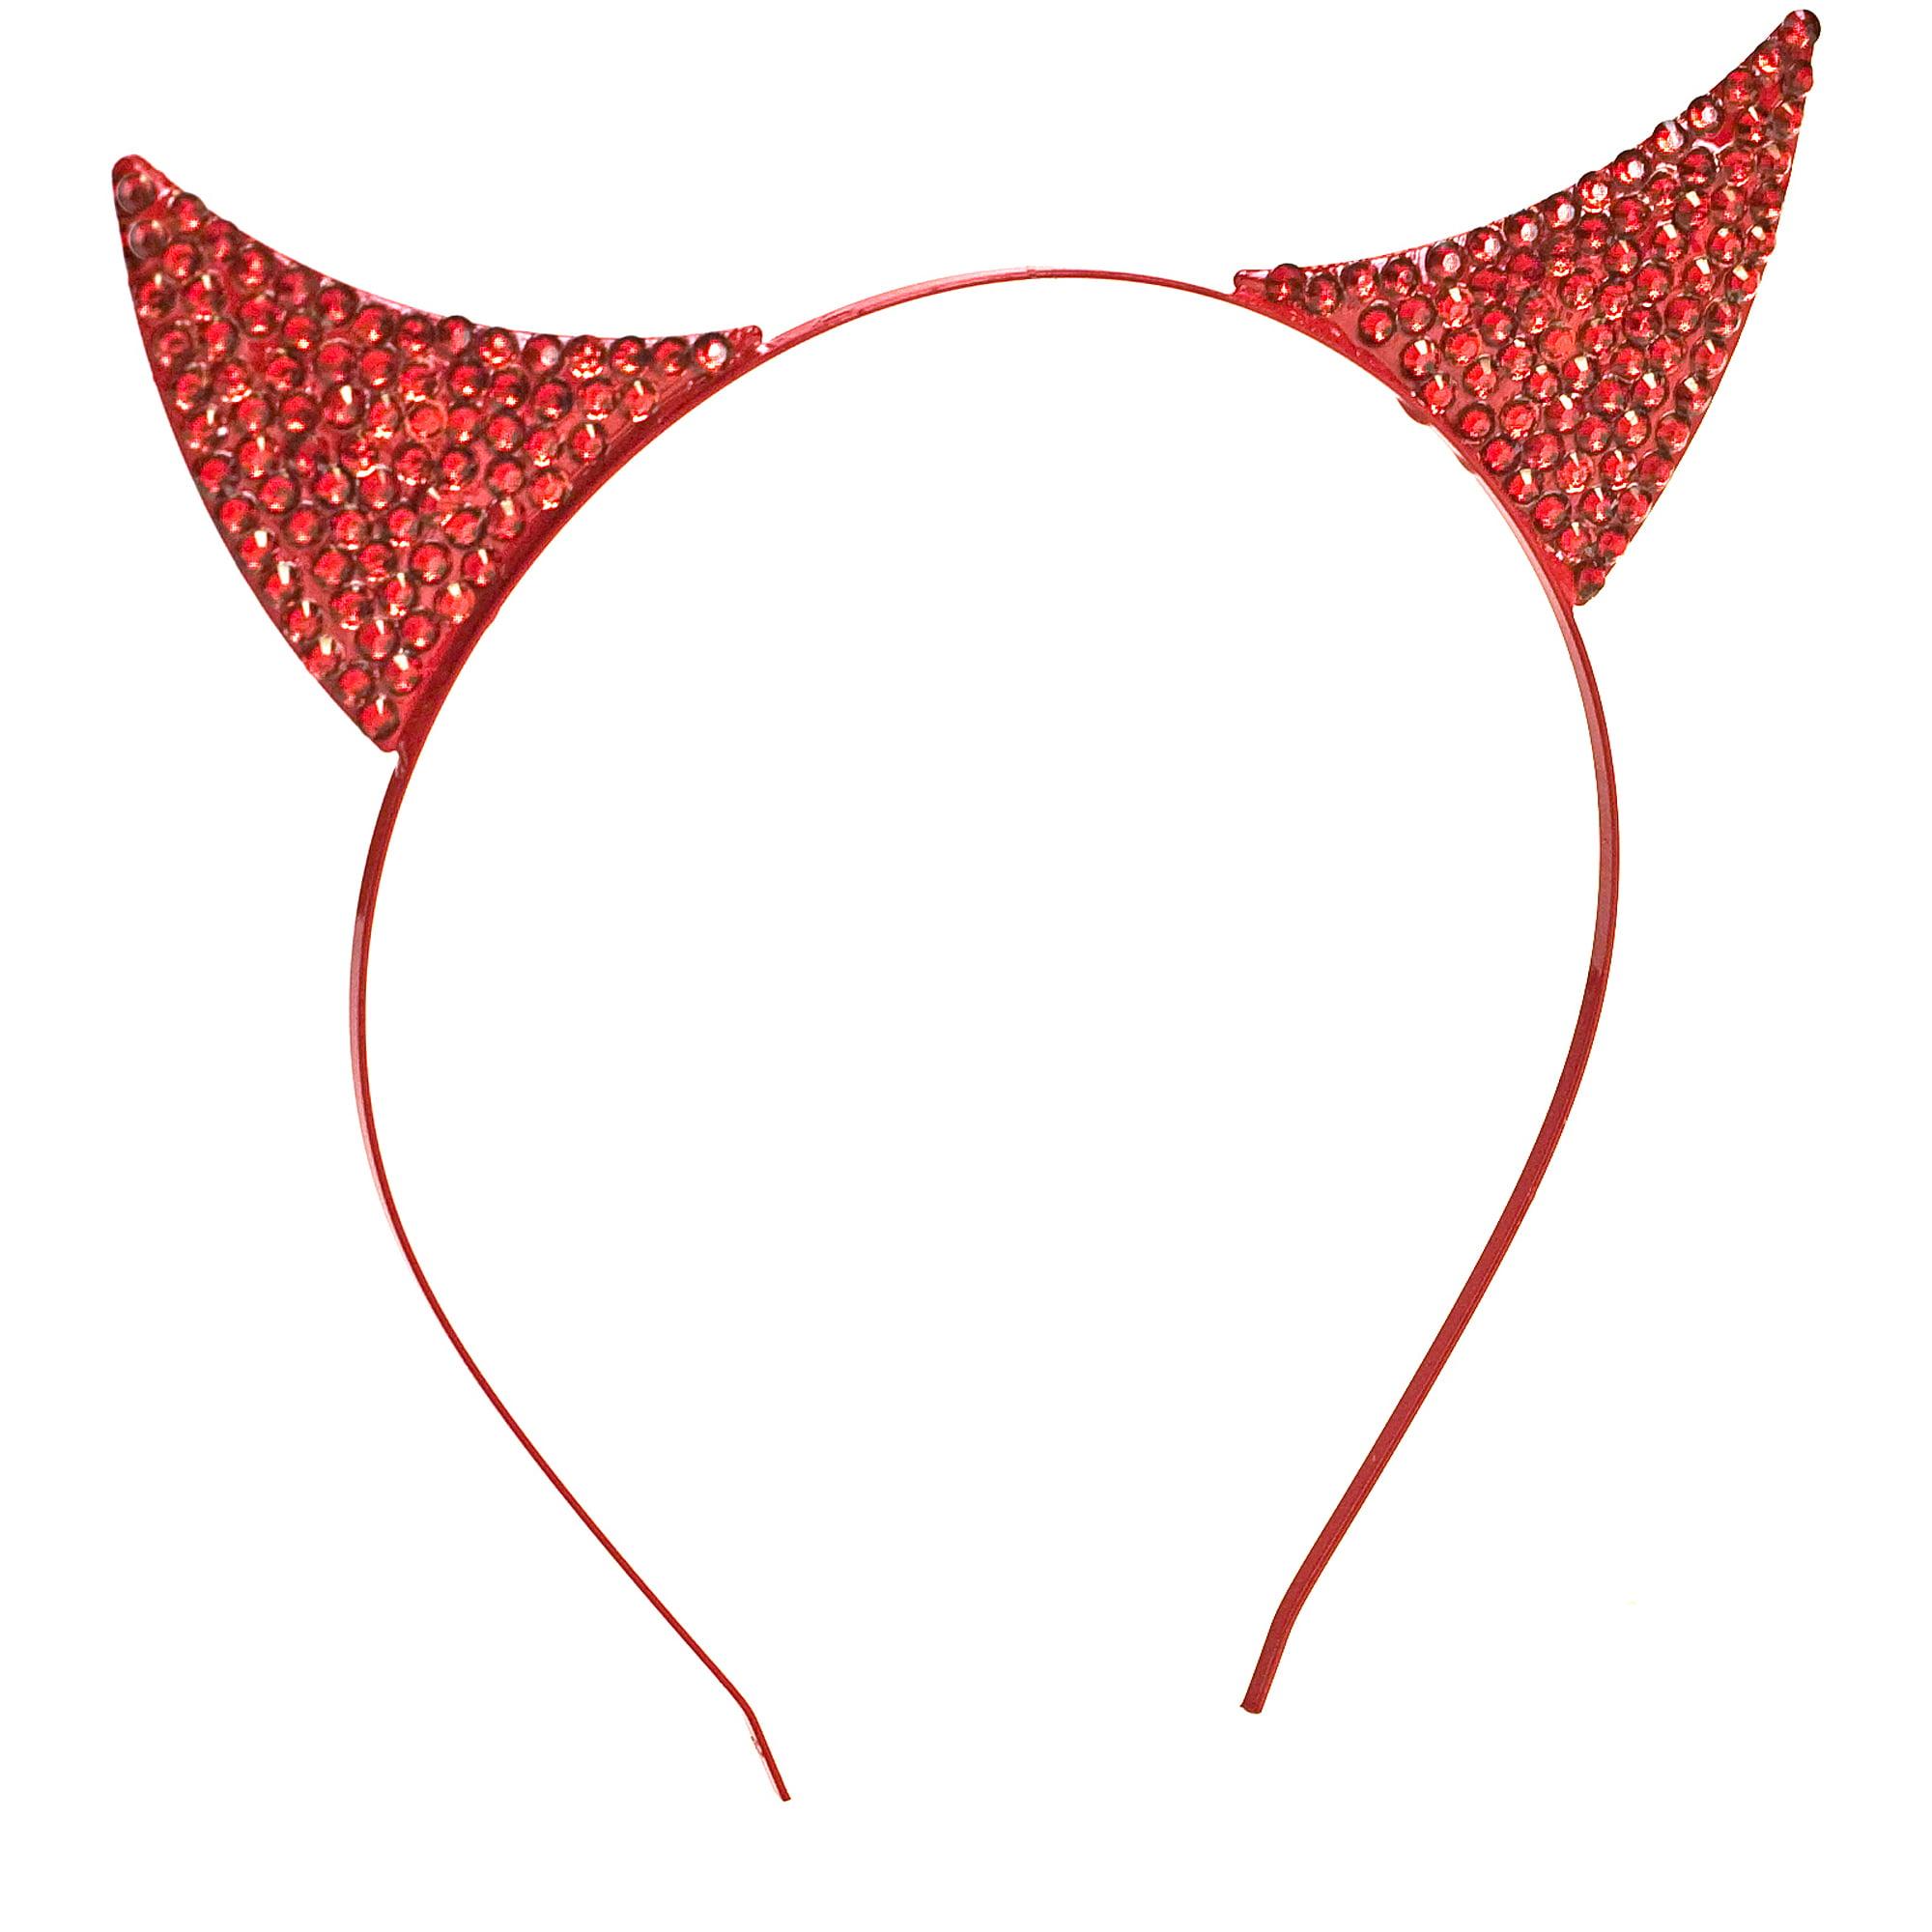 rhinestone devil horns halloween accessory walmartcom - Devil Horns For Halloween